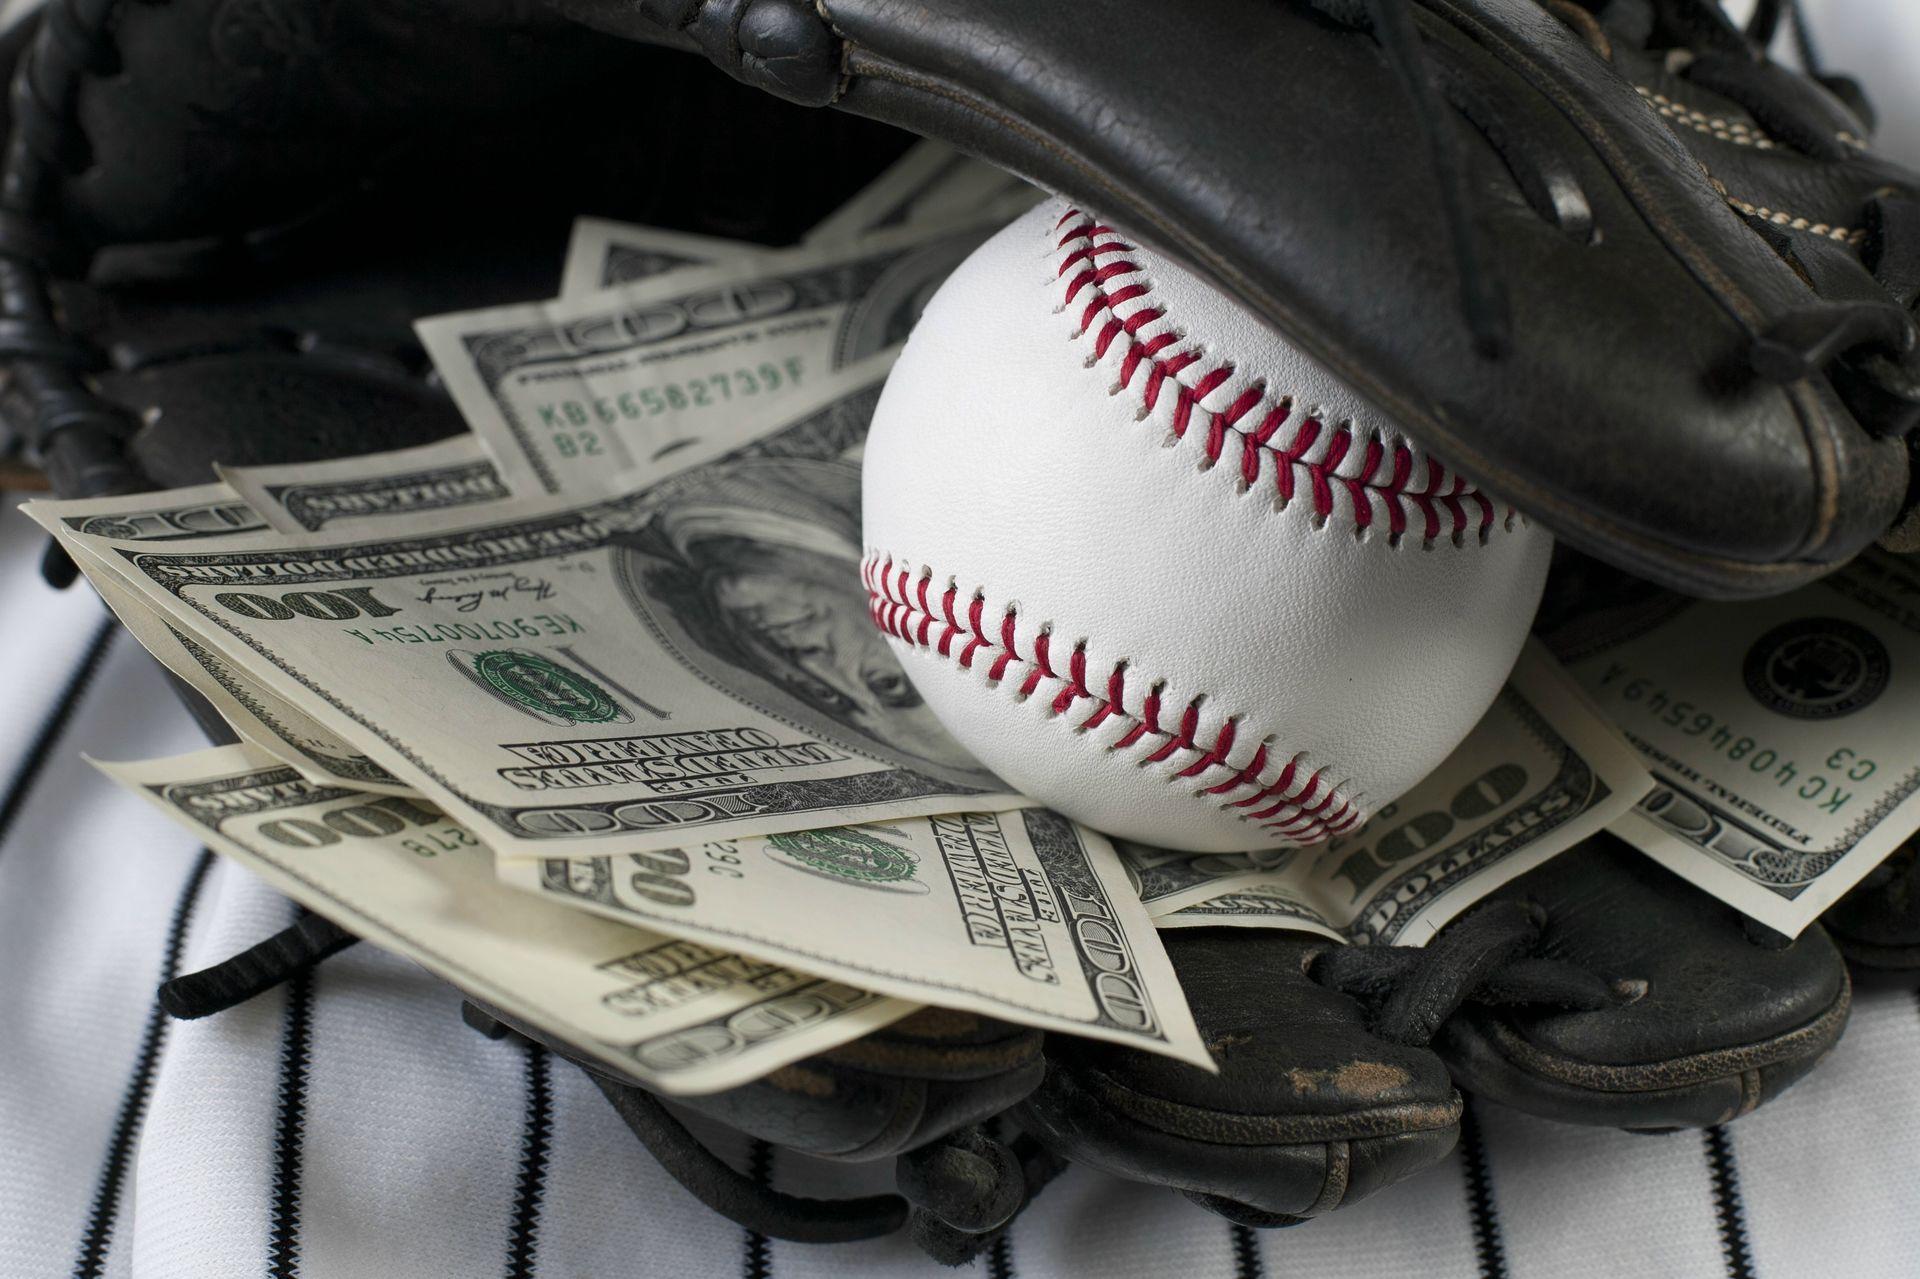 bigstock-business-of-baseball-and-money-34450892-money